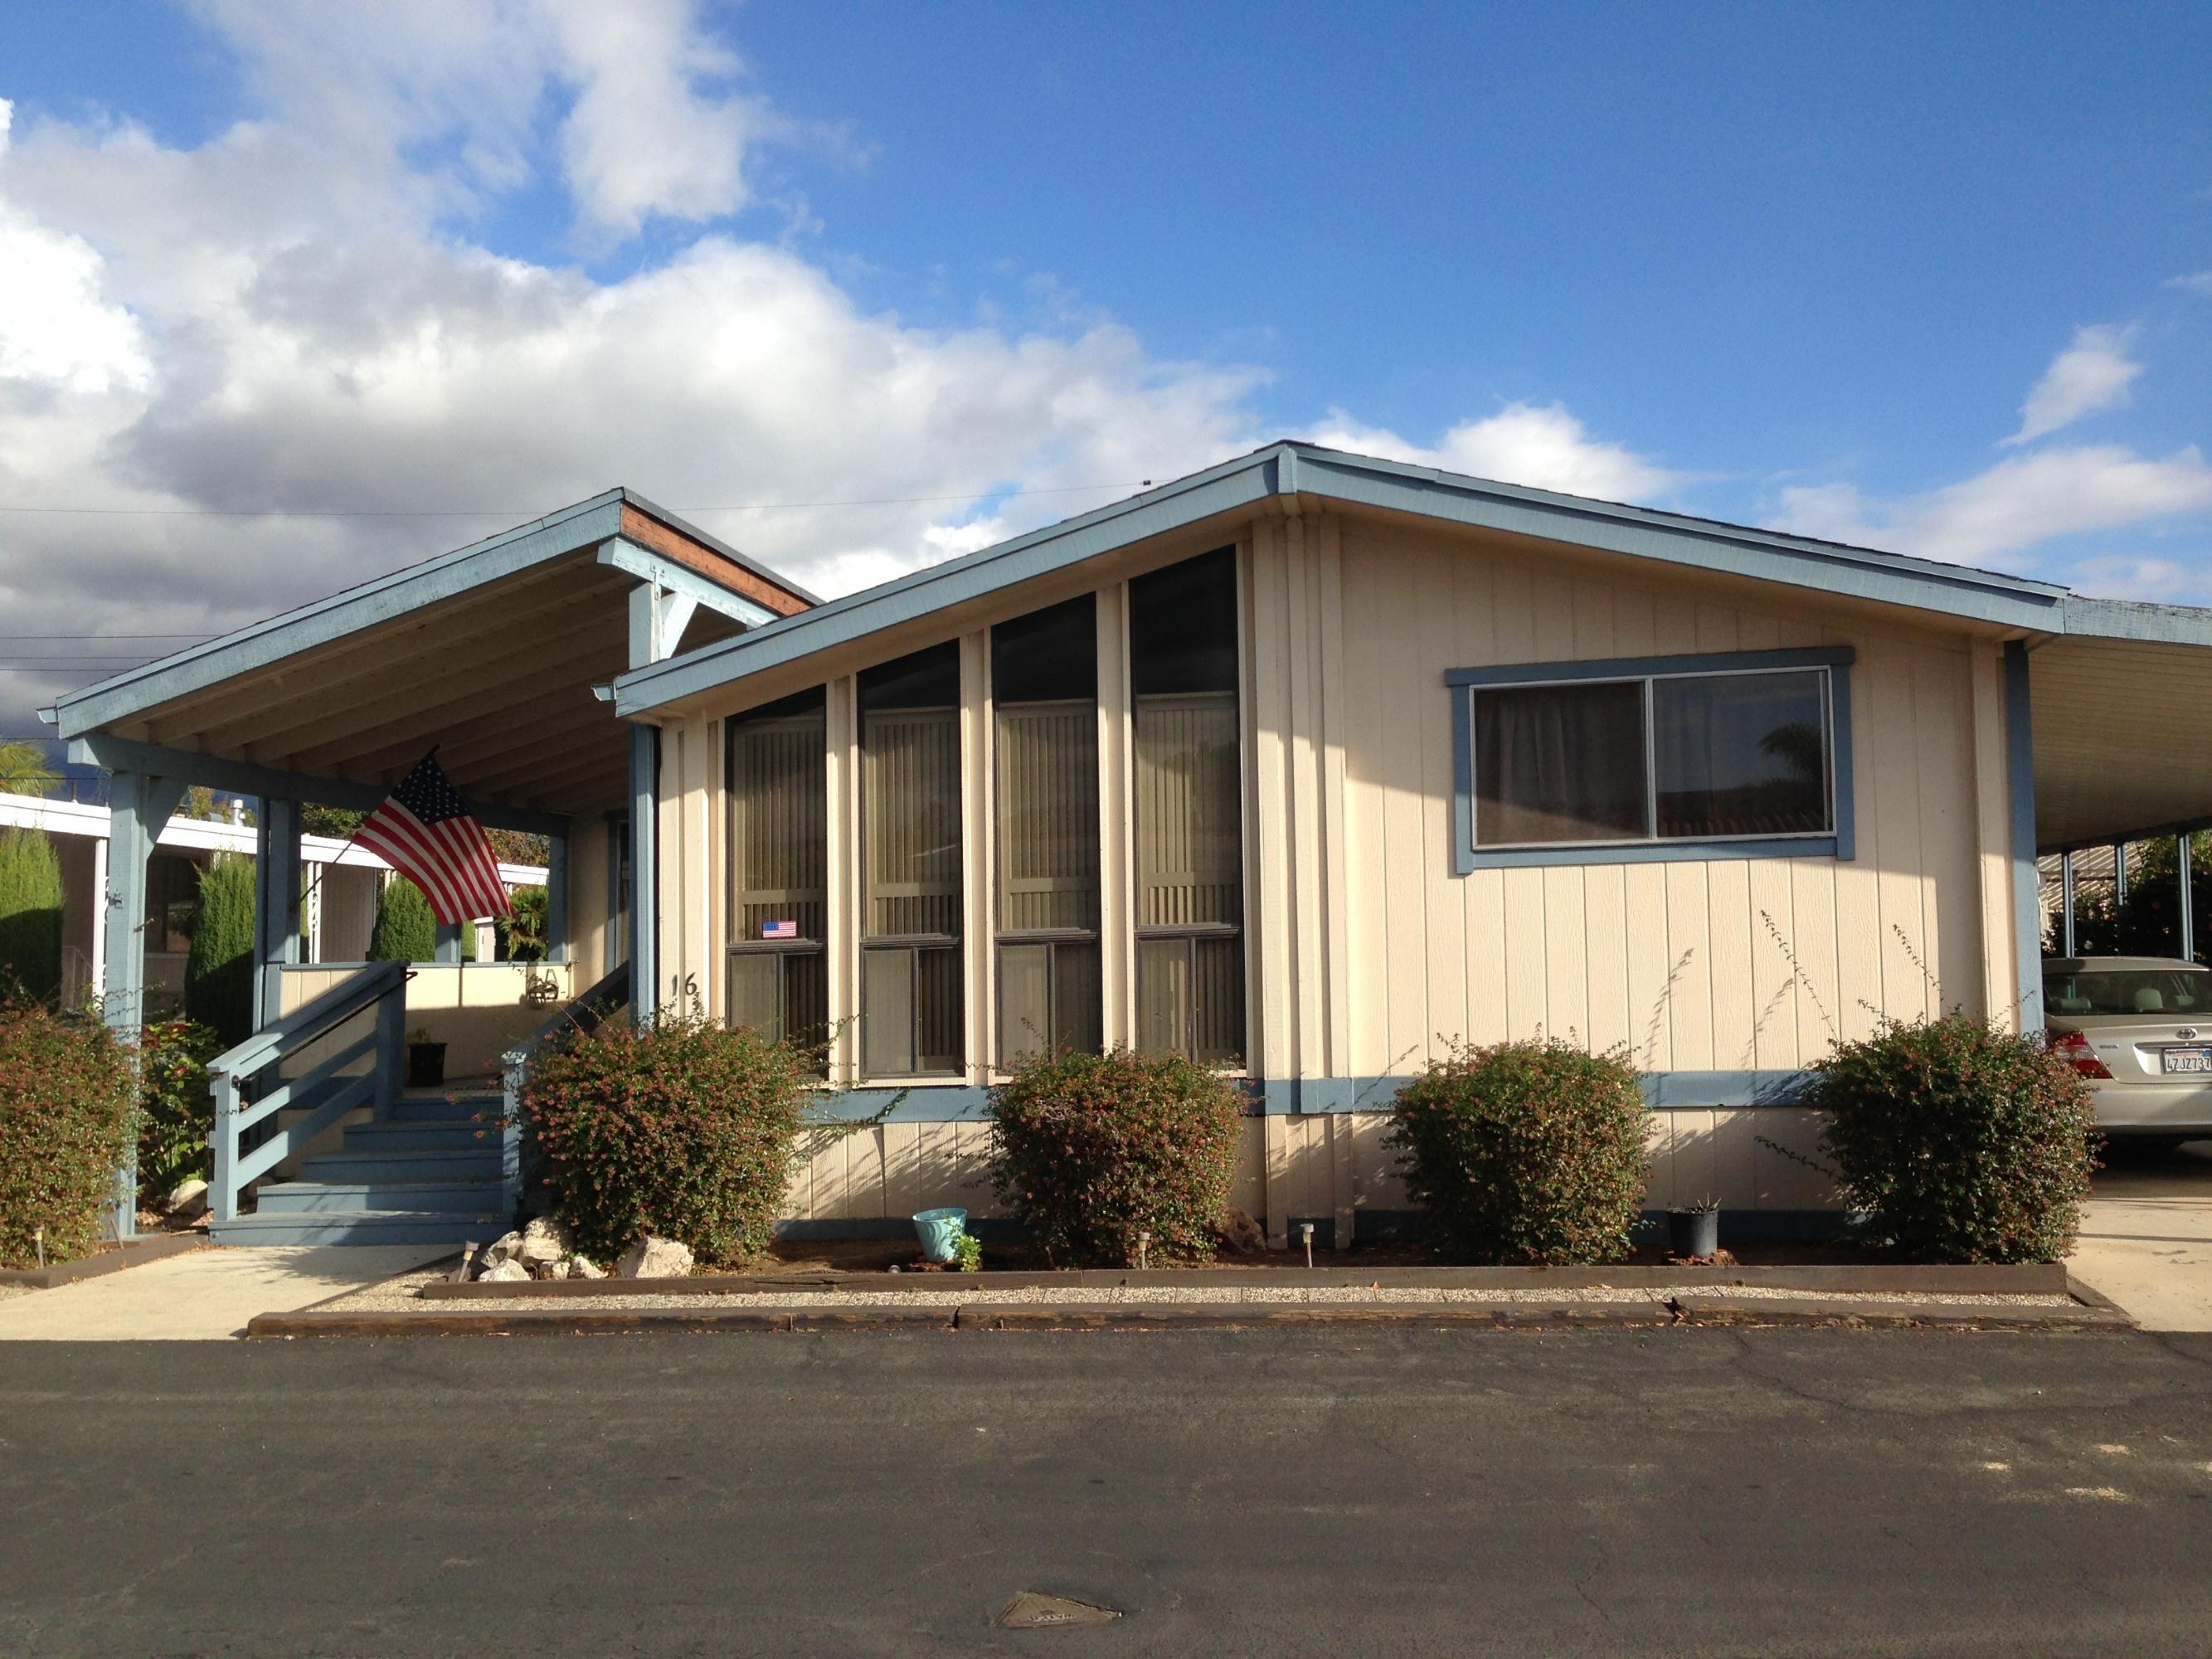 Property photo for 340 Old Mill Rd #16 Santa Barbara, California 93110 - 13-3653